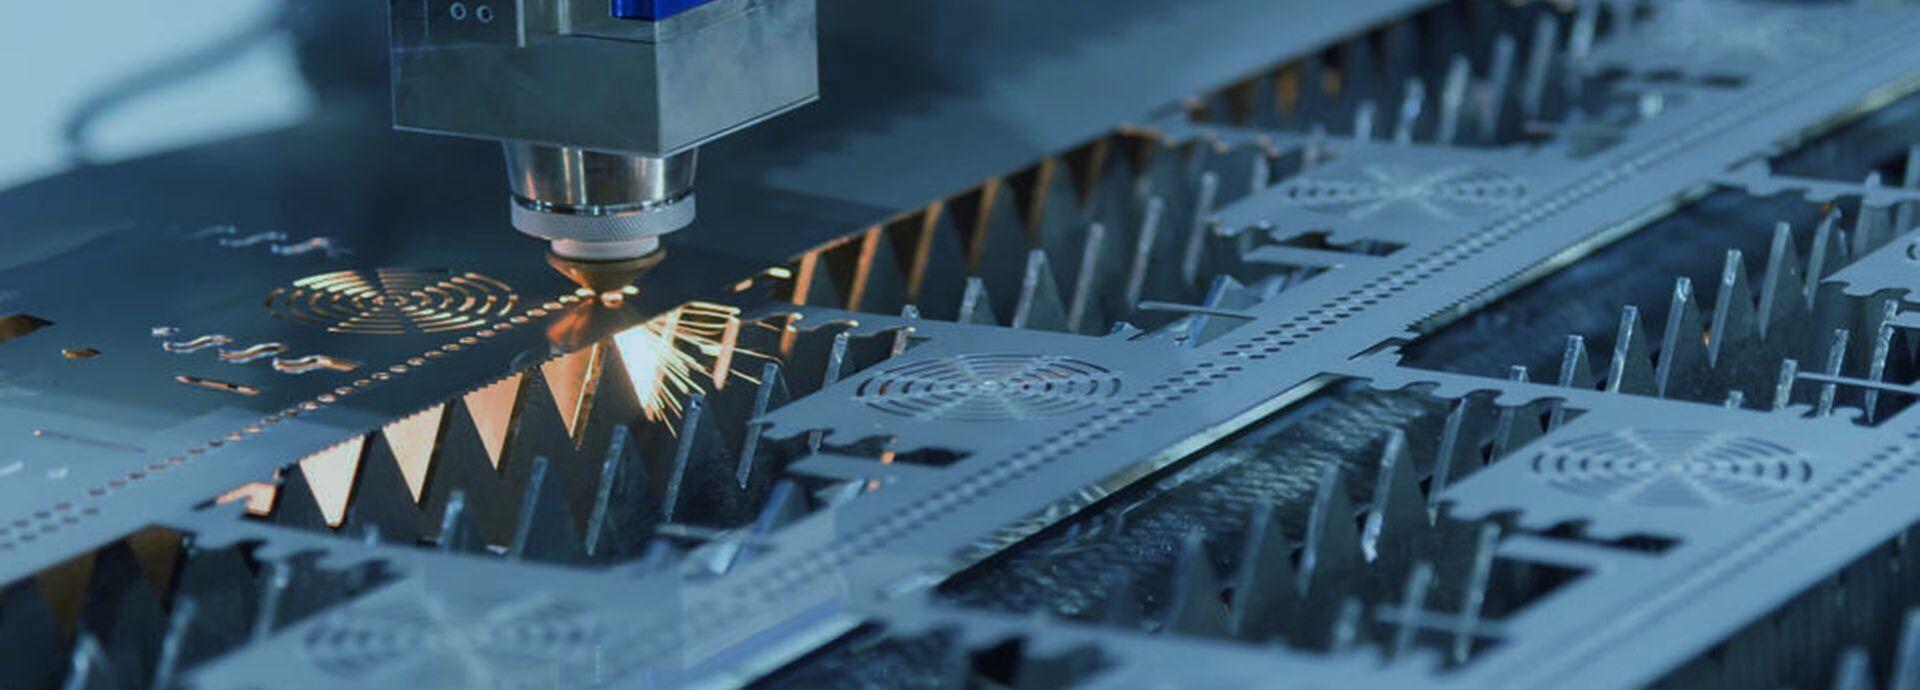 laser cutting machine parts deburring